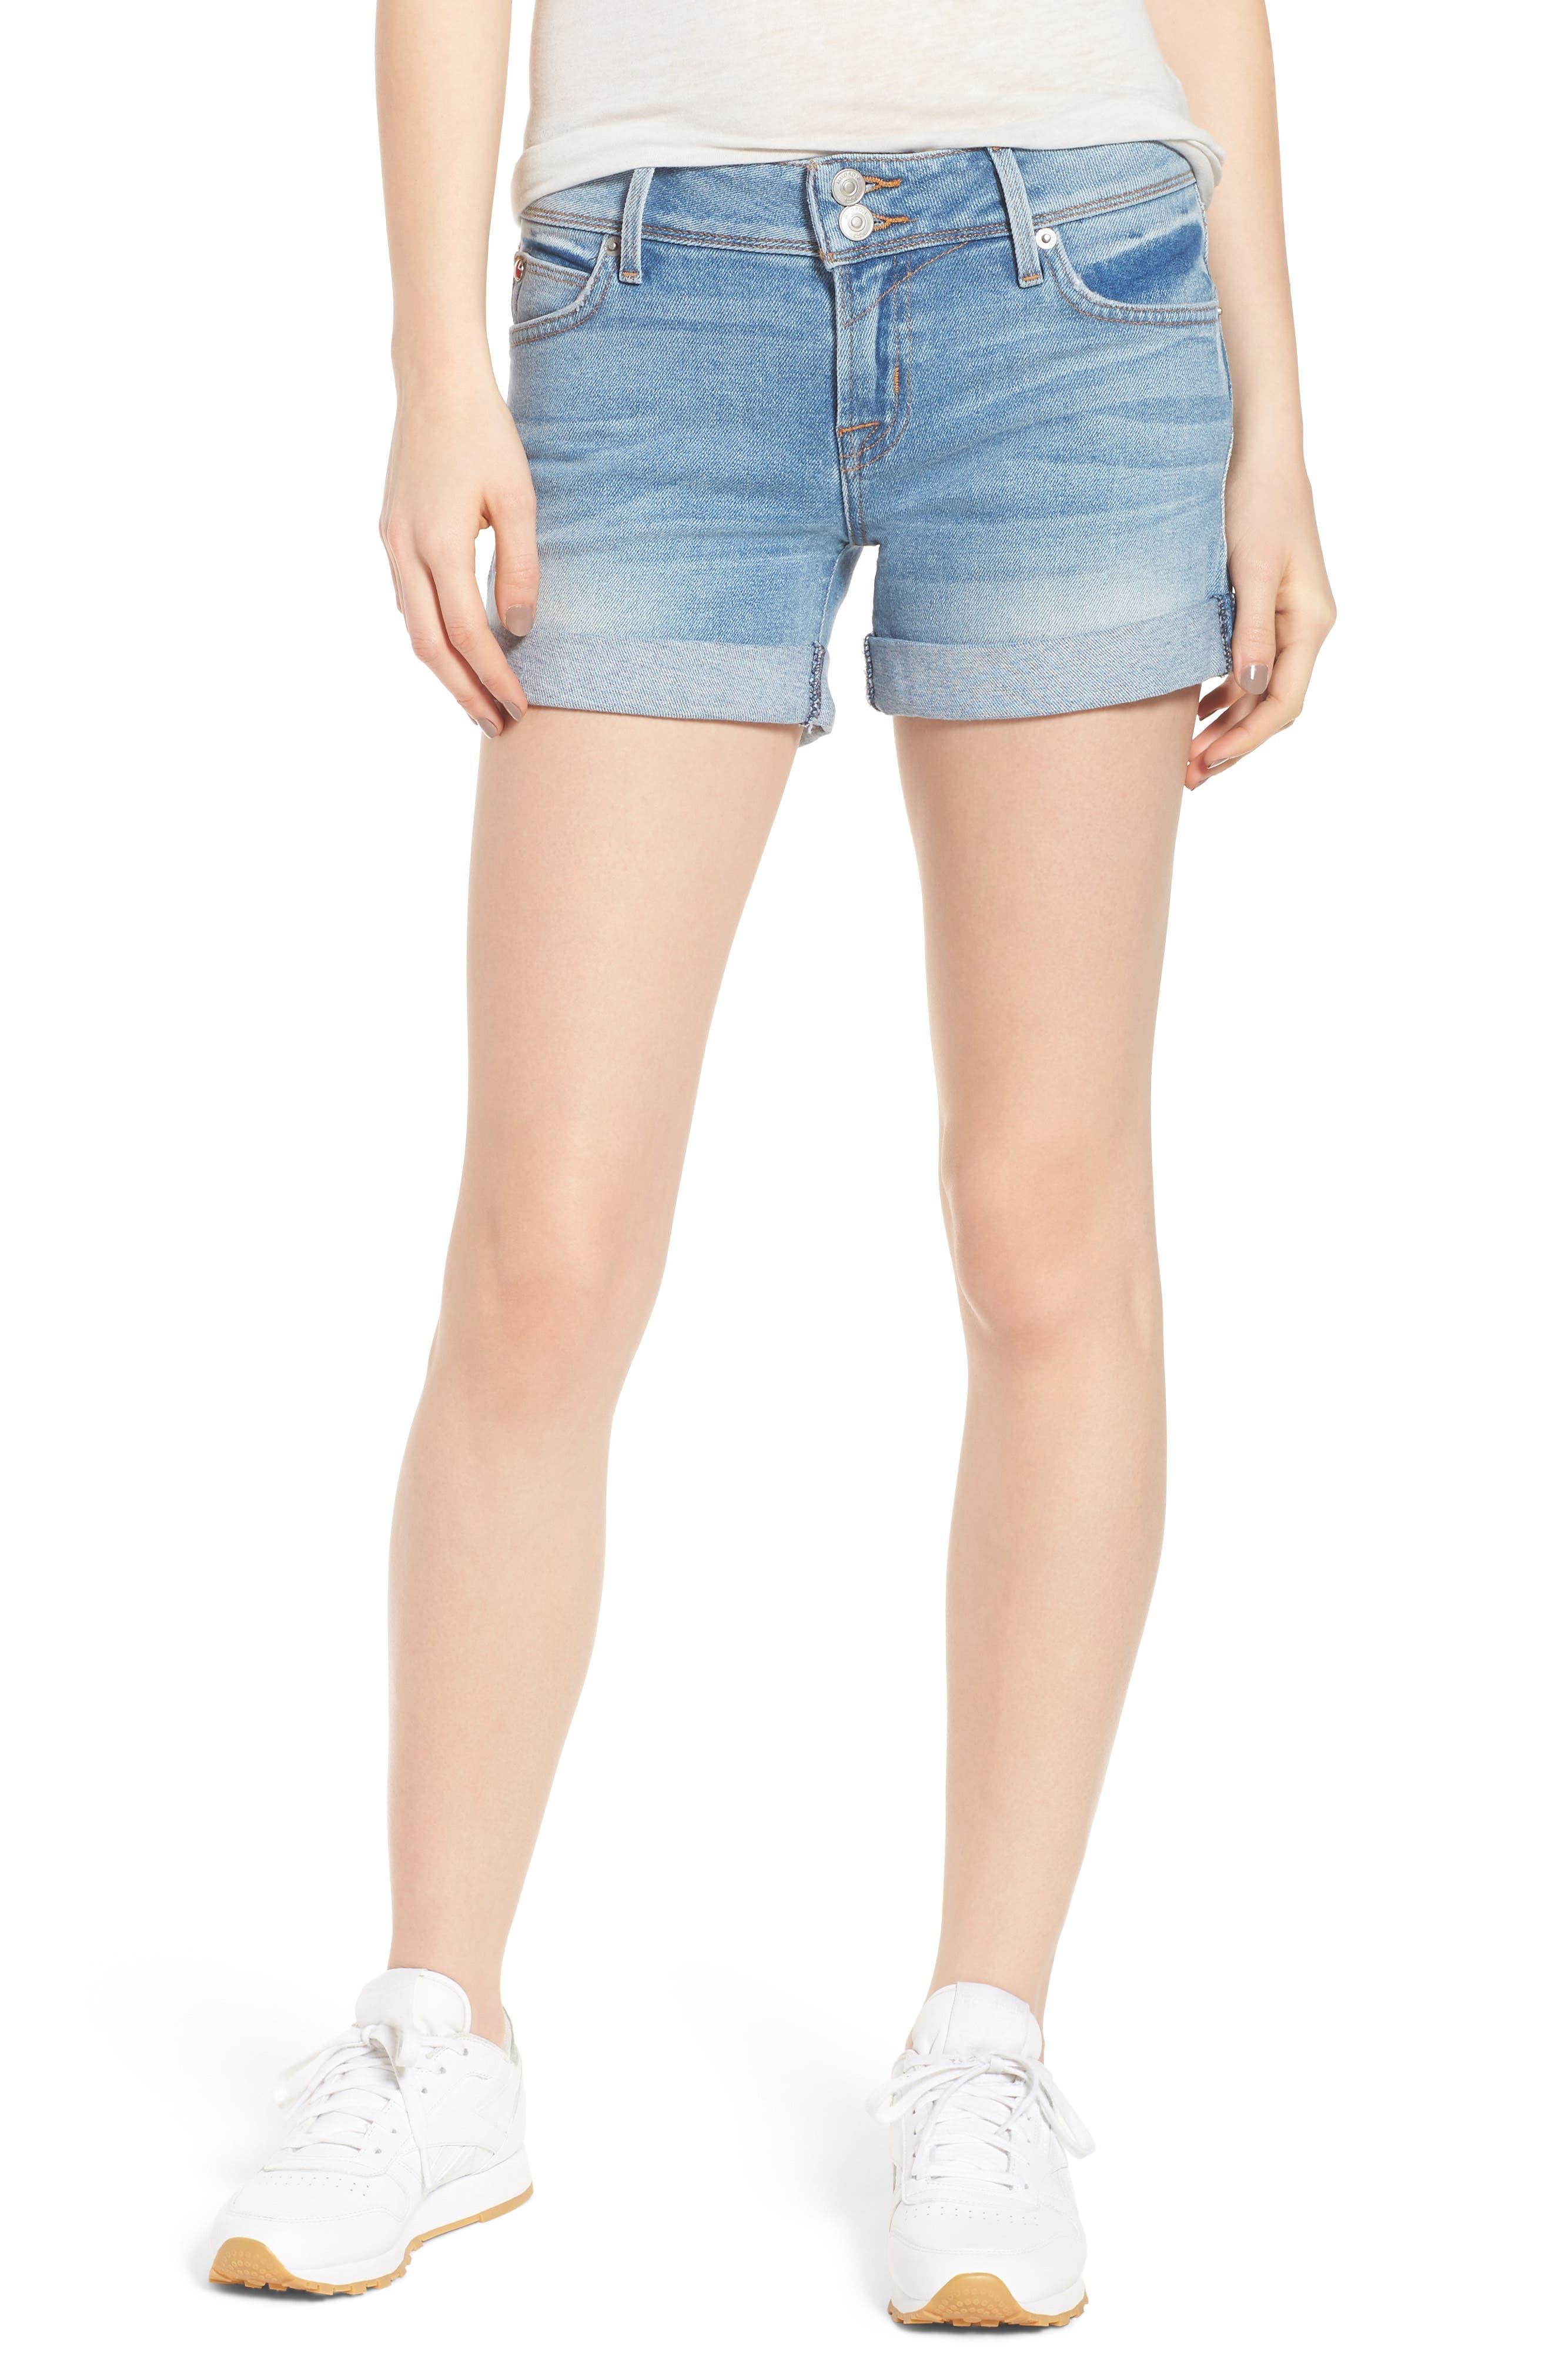 HUDSON JEANS Croxley Cuff Denim Shorts, Main, color, 425